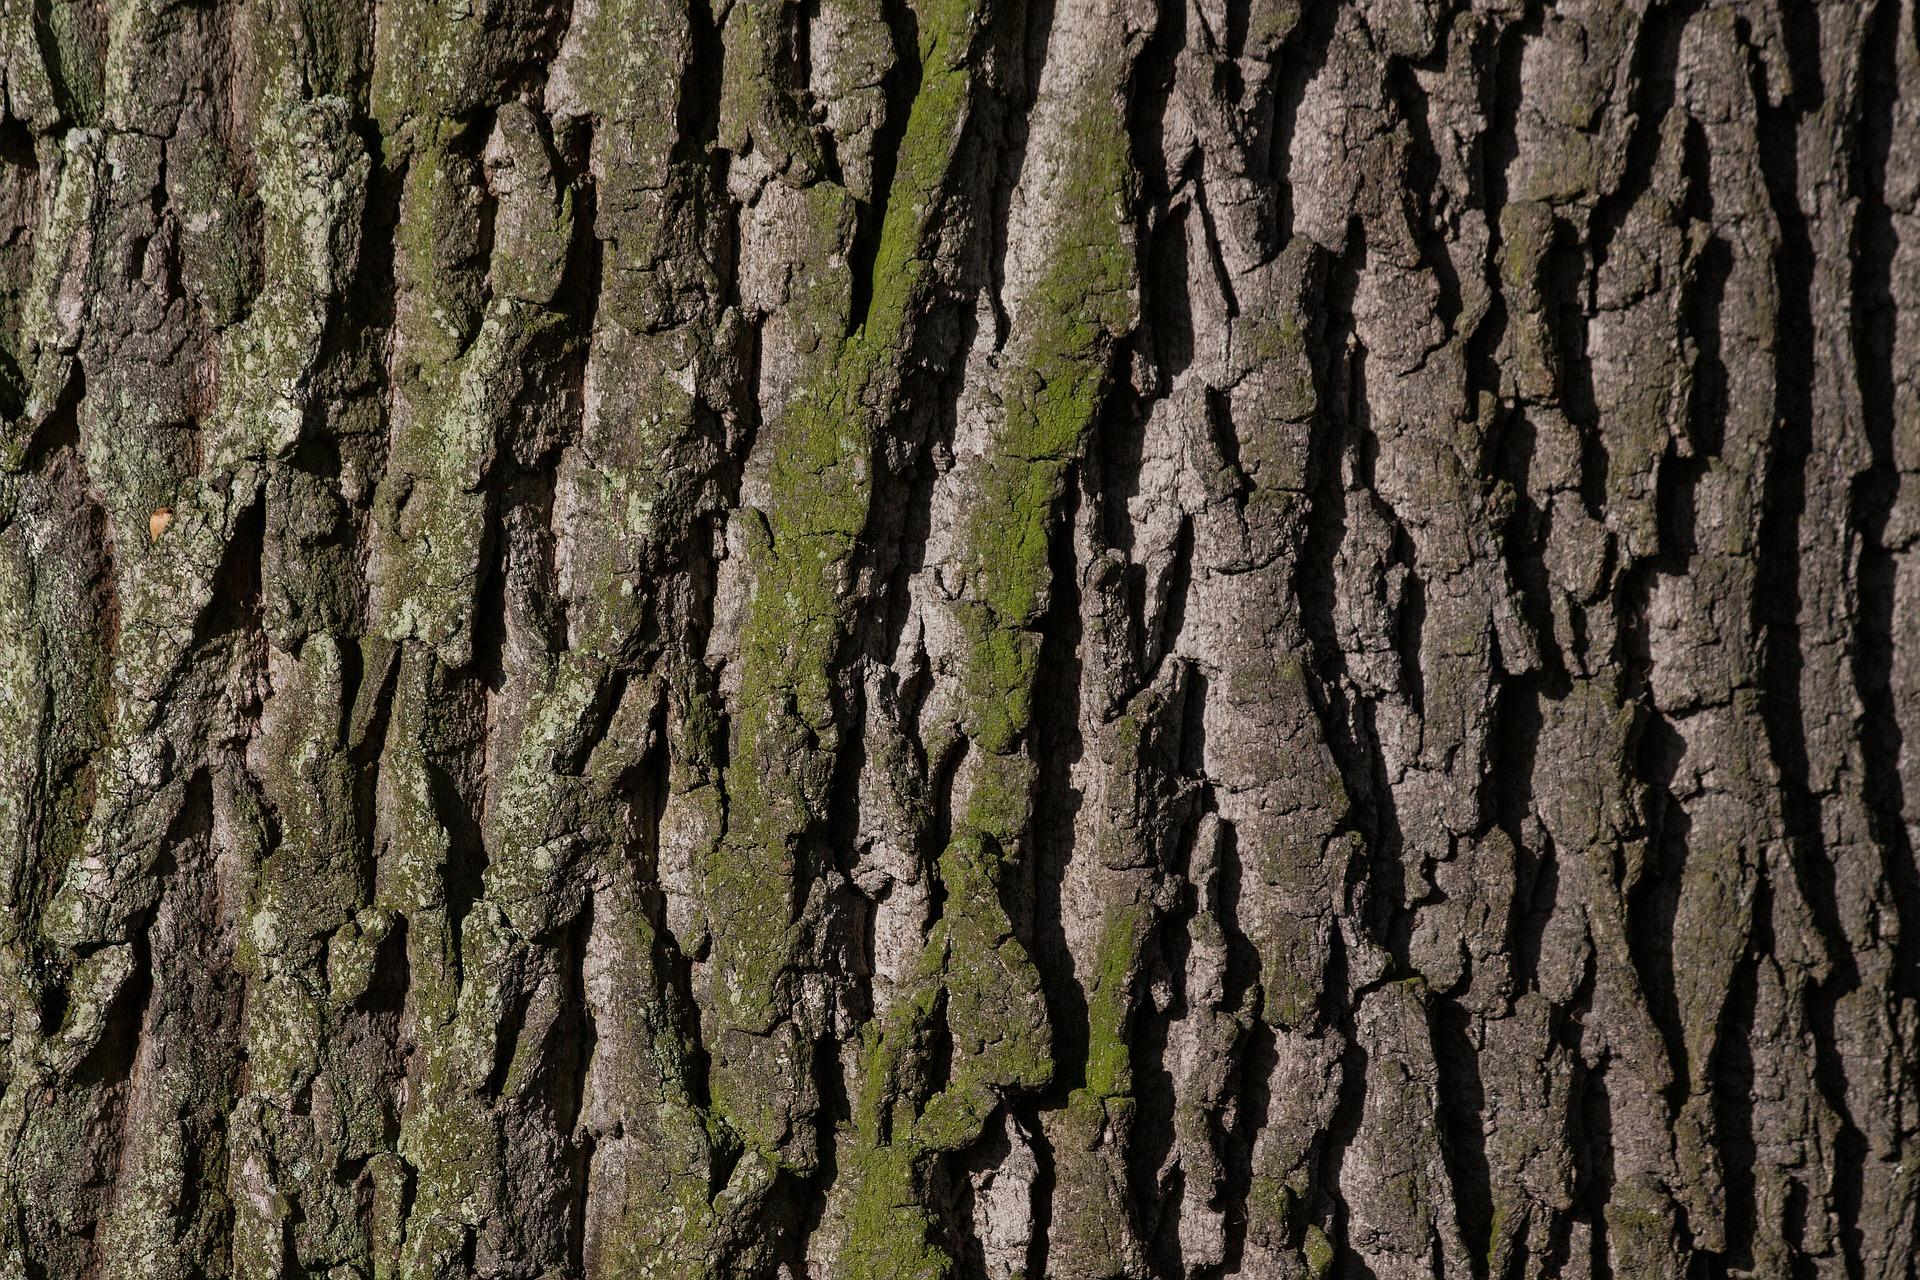 bark-207252_1920.jpg